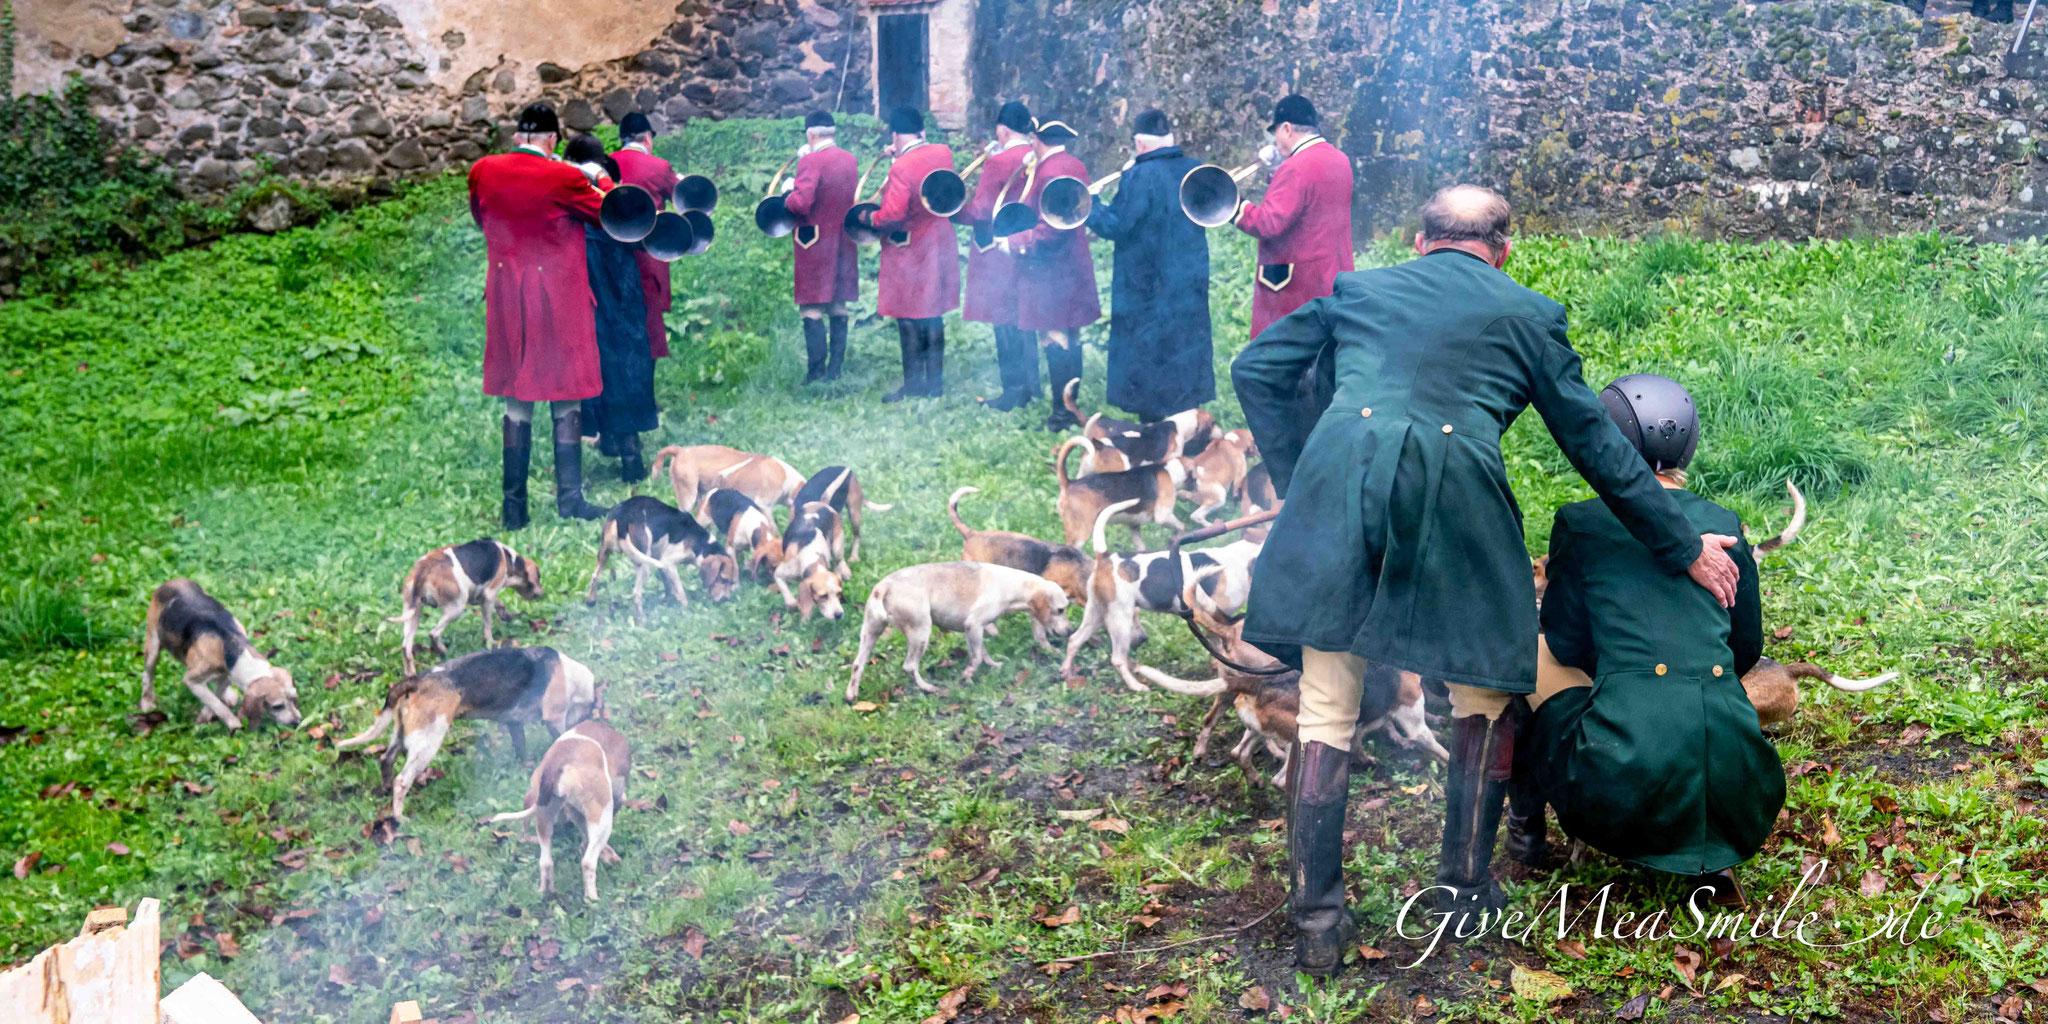 Jagdfotos vom Team @Givemeasmile.de auf der Fotojagd, Peter Jäger   #ronneburg #givemeasmilede #vogelsbergmeute #foxhounds #beagles #jagdreiten #schleppjagd